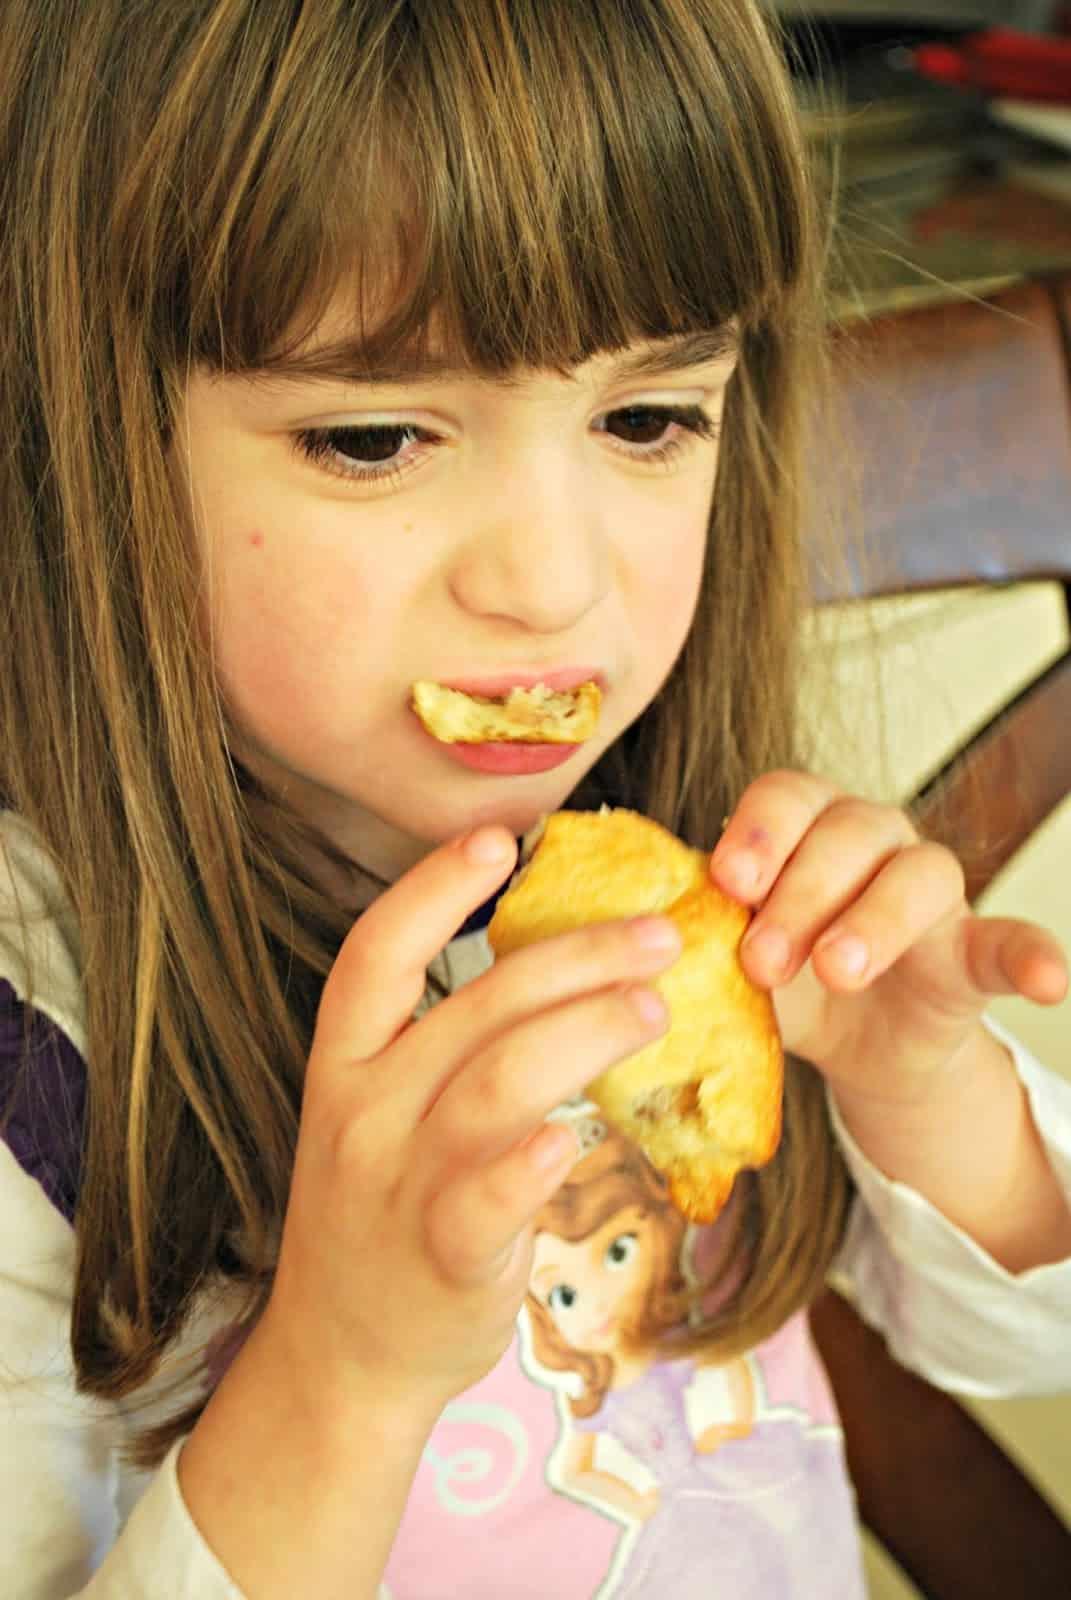 child eating crescent rolls